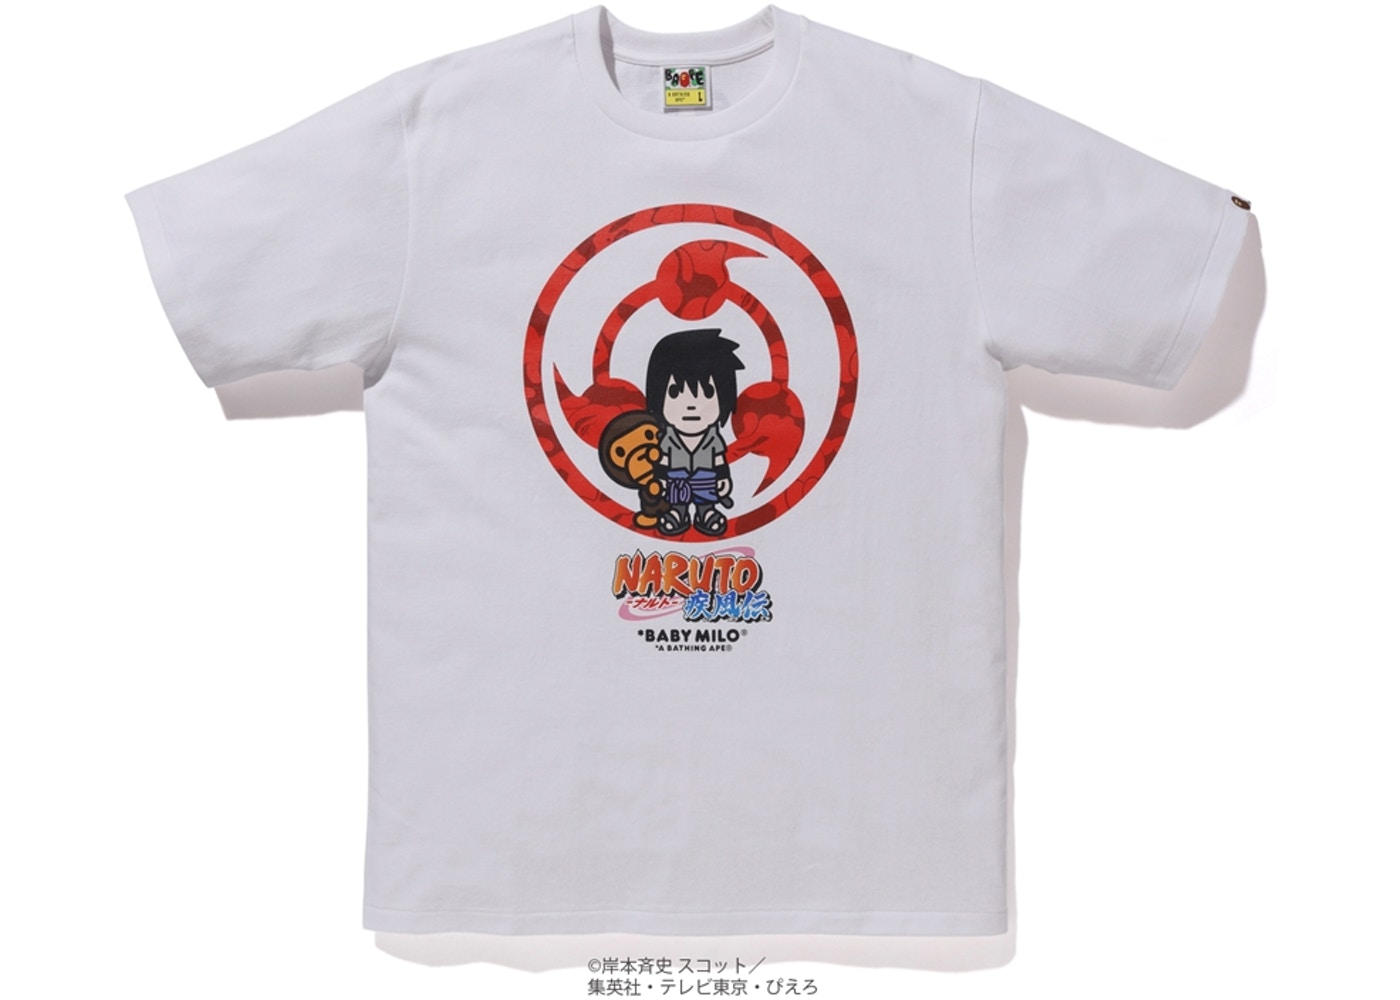 50ff1fa5 Sell. or Ask. Size L. View All Bids. BAPE x Naruto Milo #2 Tee White